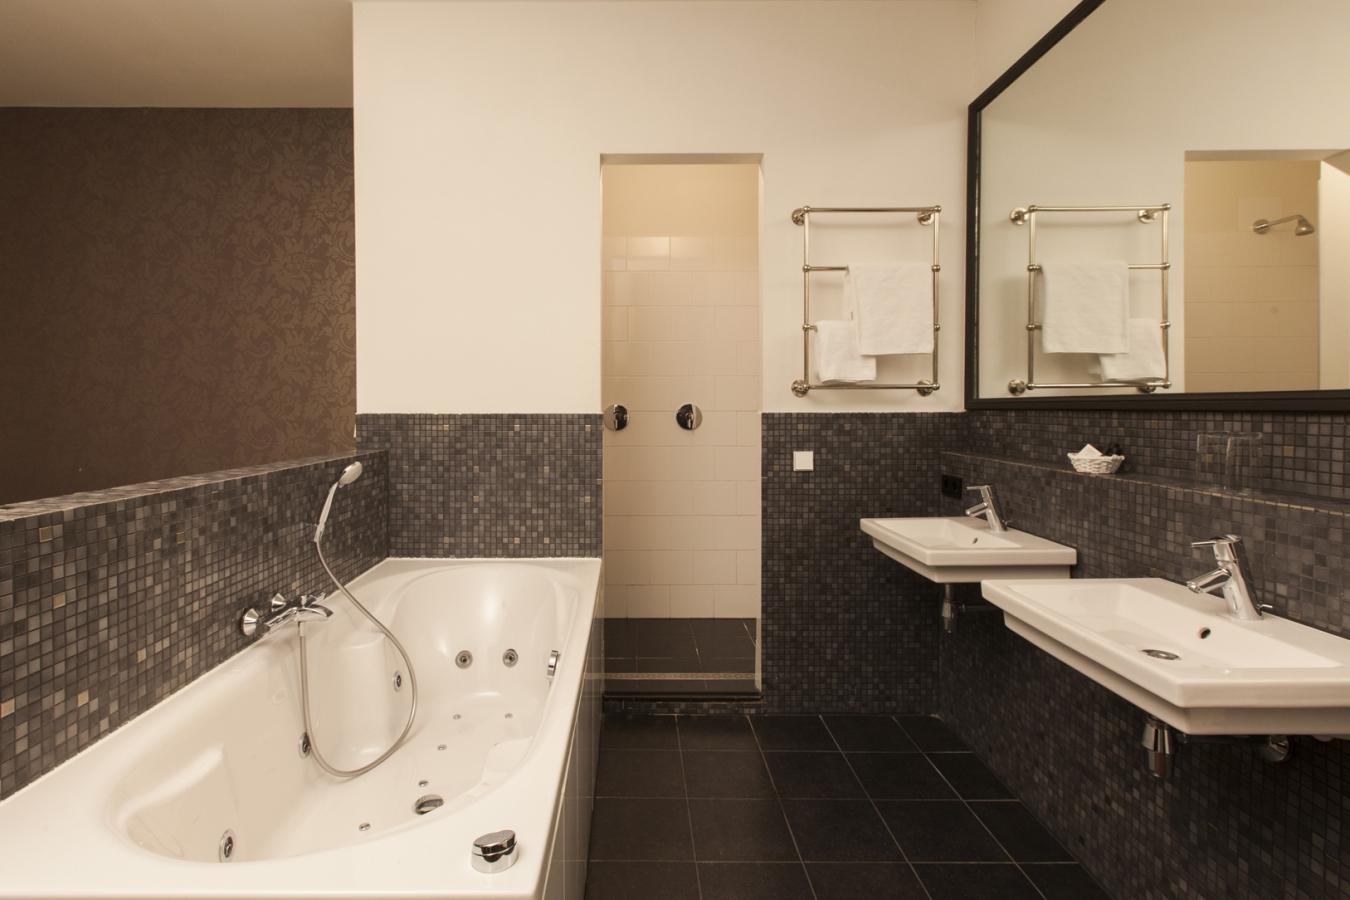 College Hotel Alkmaar badkamer - OTD toegang & comfort B.V. hotel ...